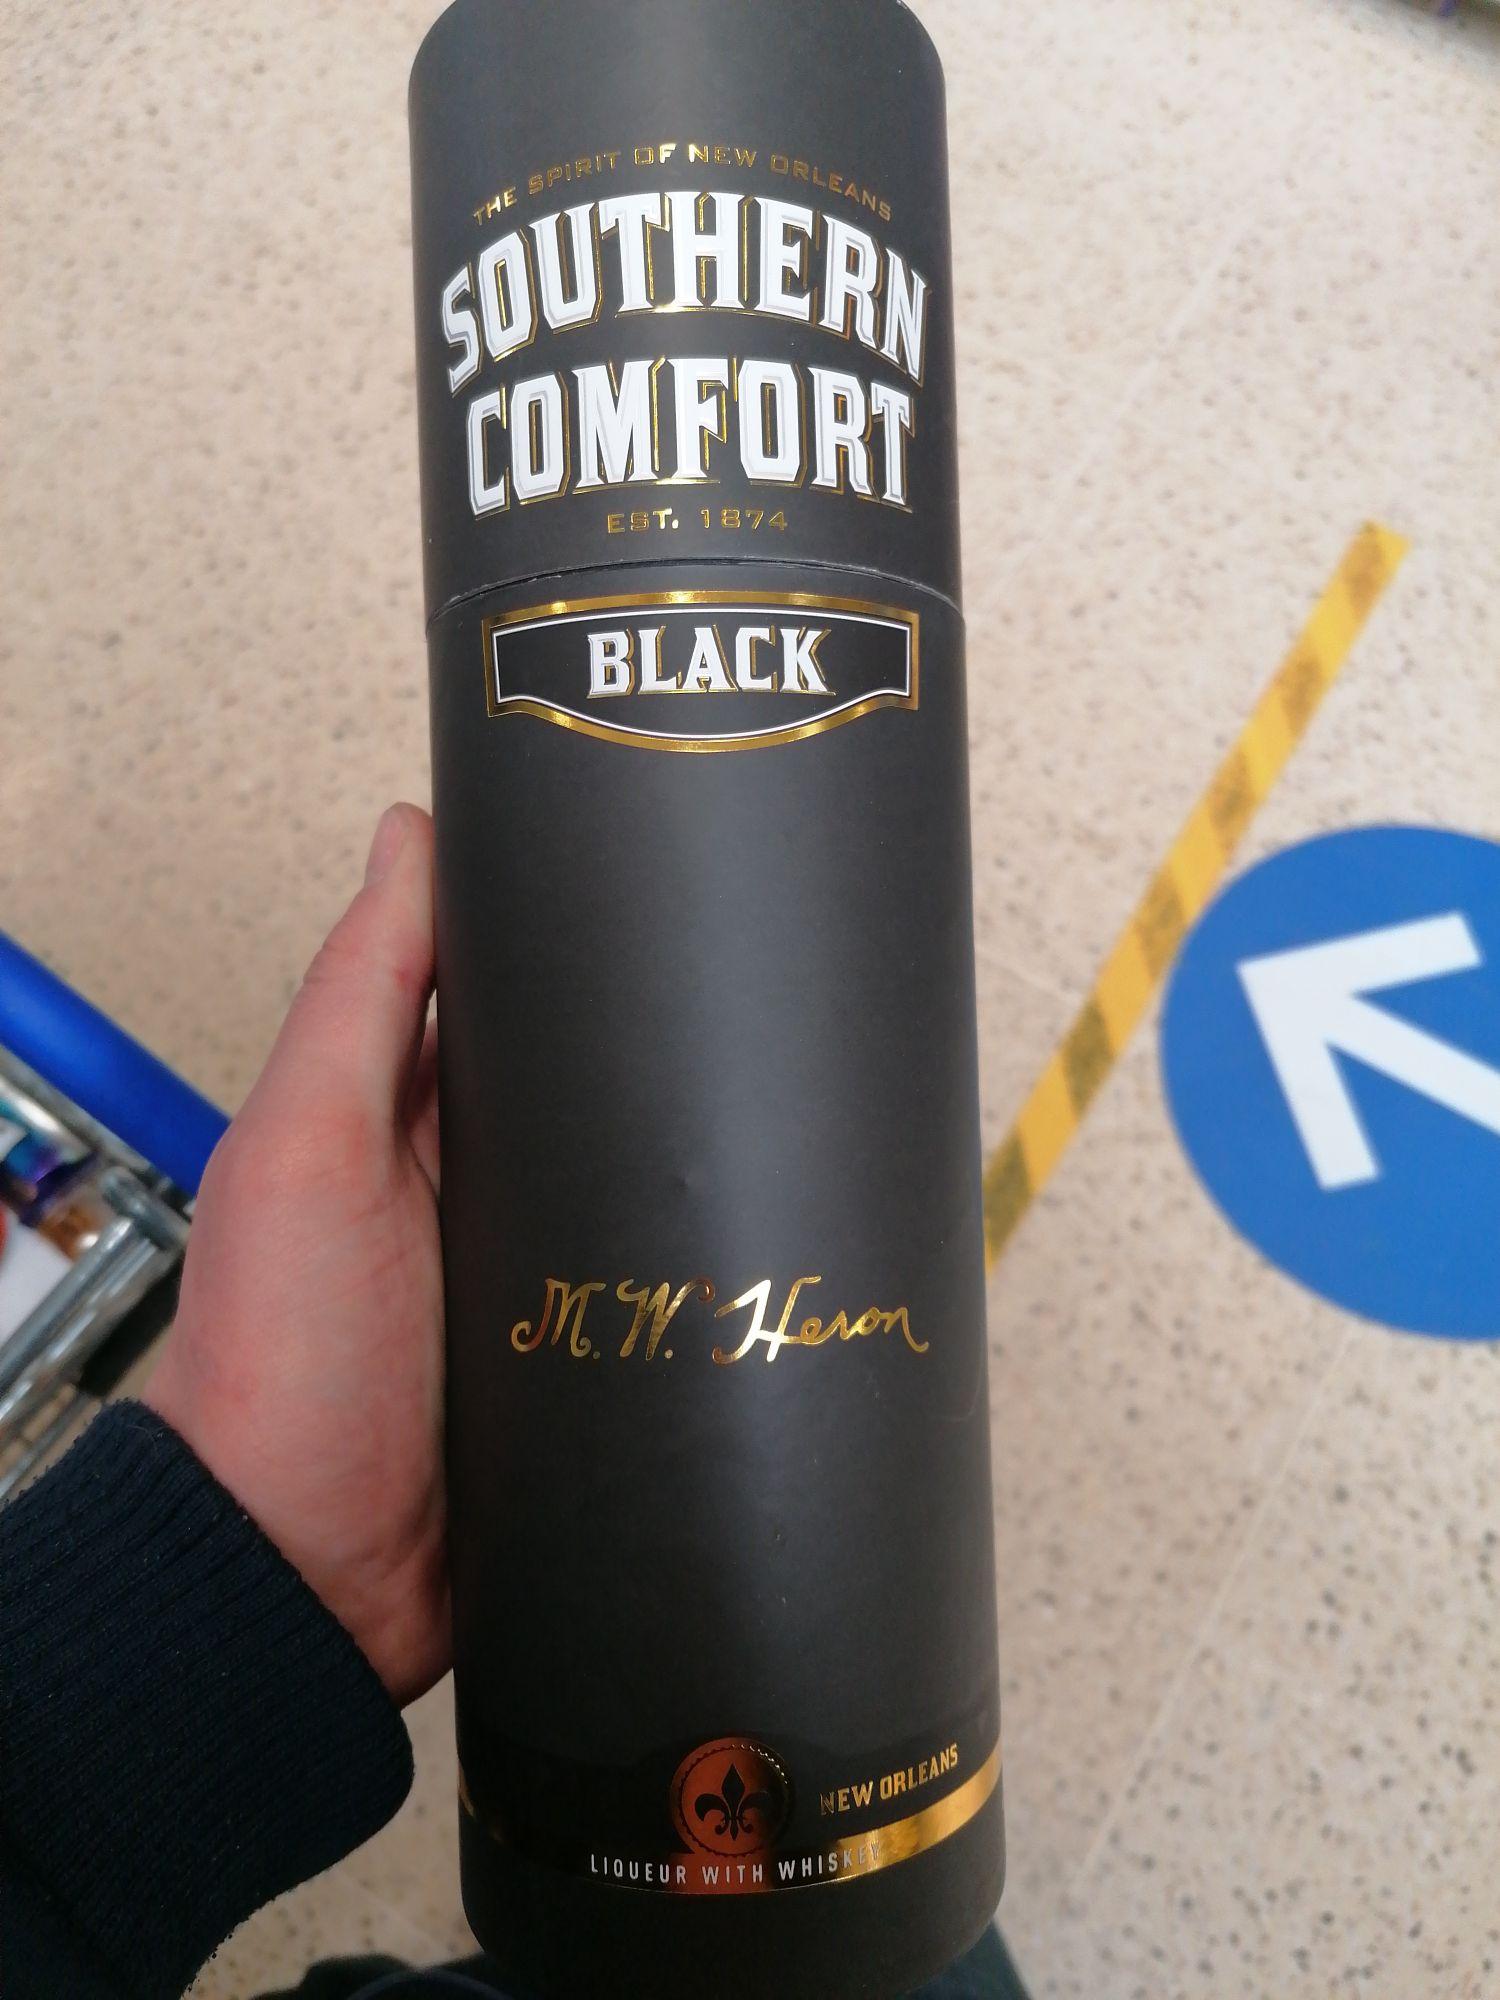 Southern Comfort Black edition 70cl £13.75 instore @ Tesco Berwick-upon-Tweed